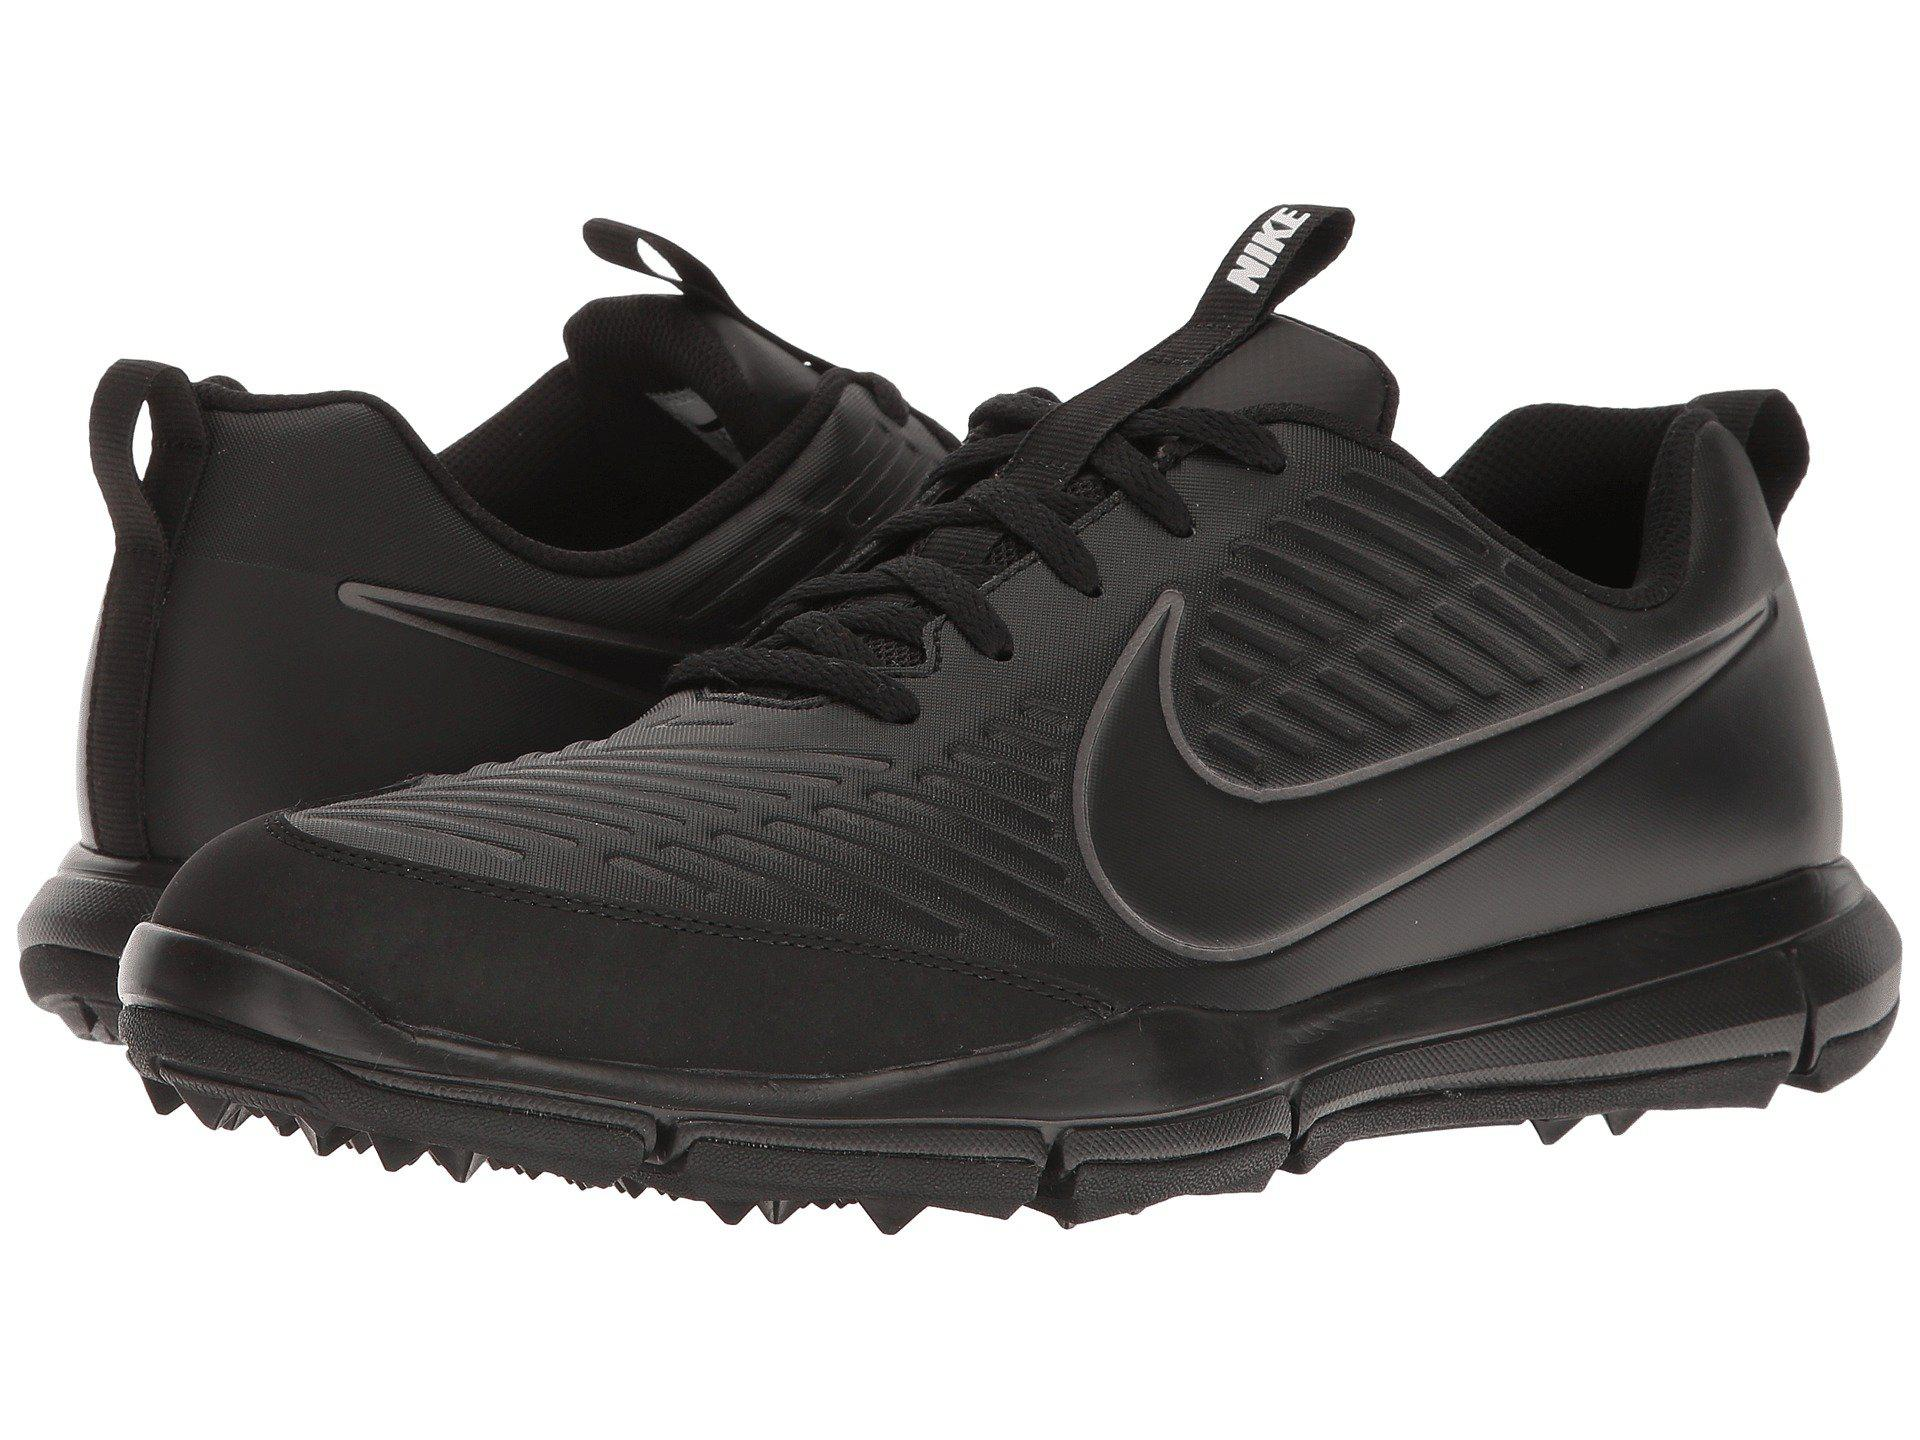 men's nike explorer 2 golf shoes